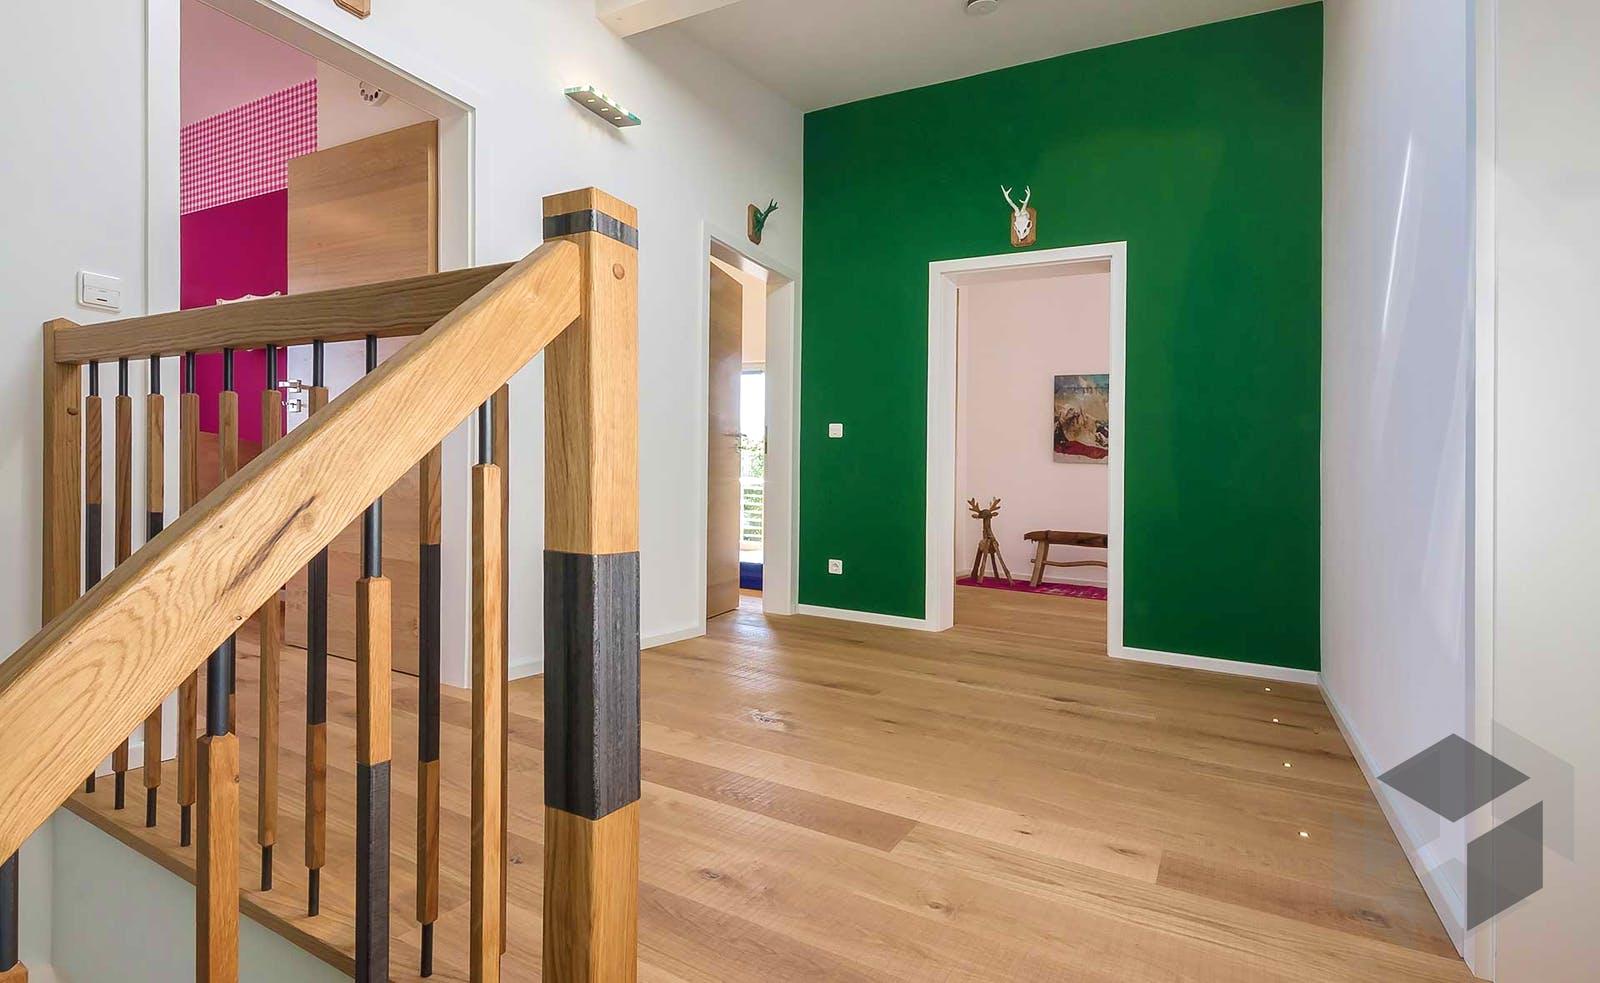 haas s 140 d von haas haus komplette daten bersicht. Black Bedroom Furniture Sets. Home Design Ideas